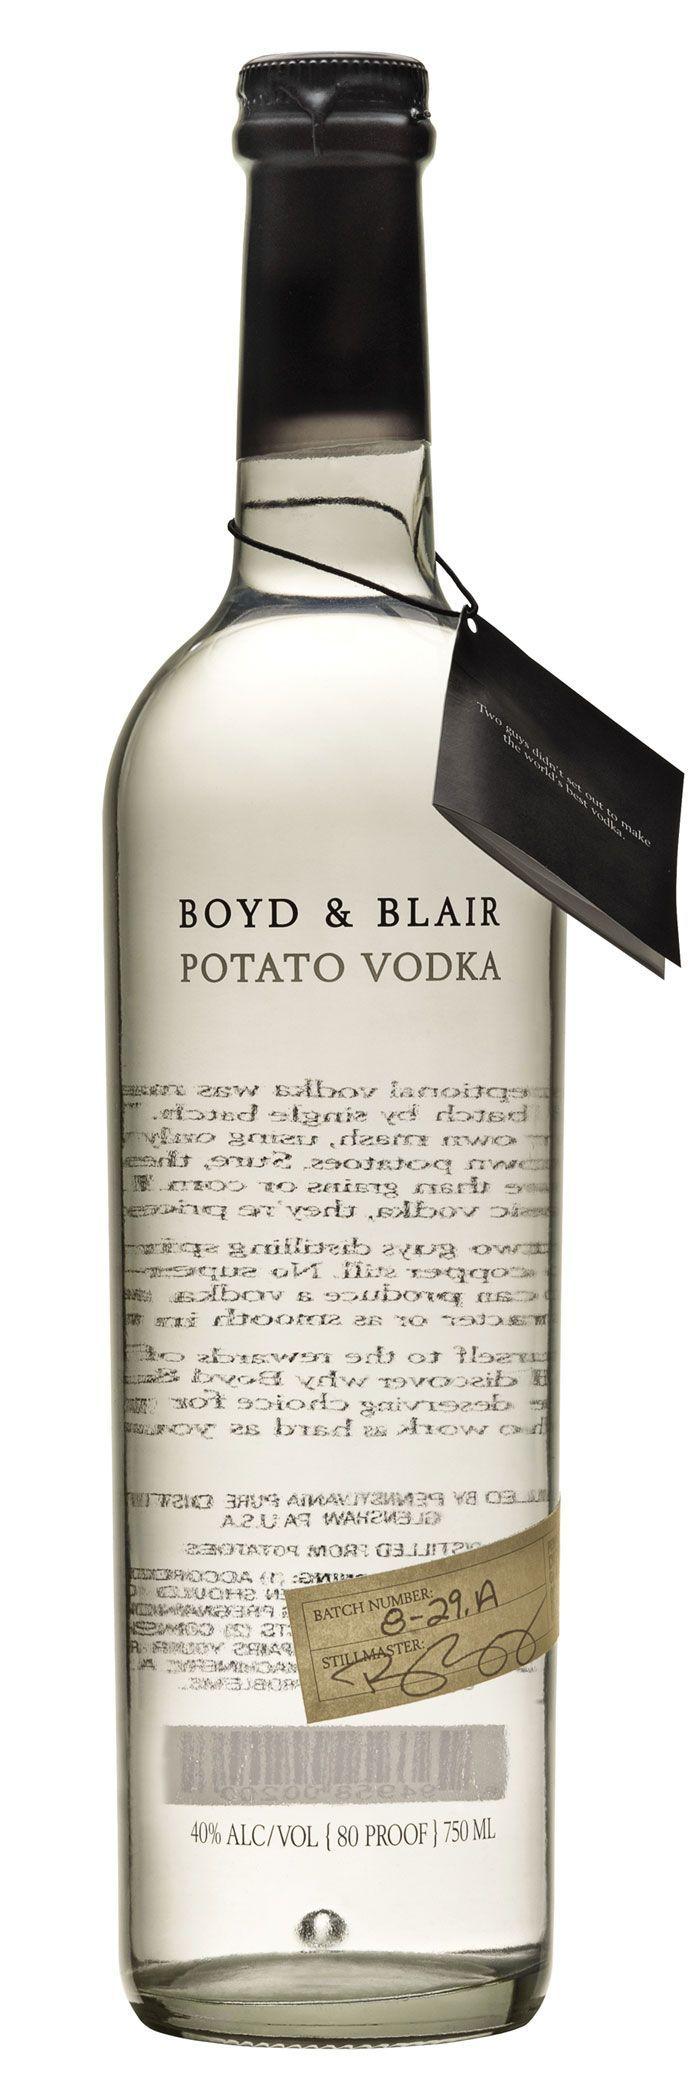 Boyd&Blair vodka  #boyd&blair #vodka #bottle